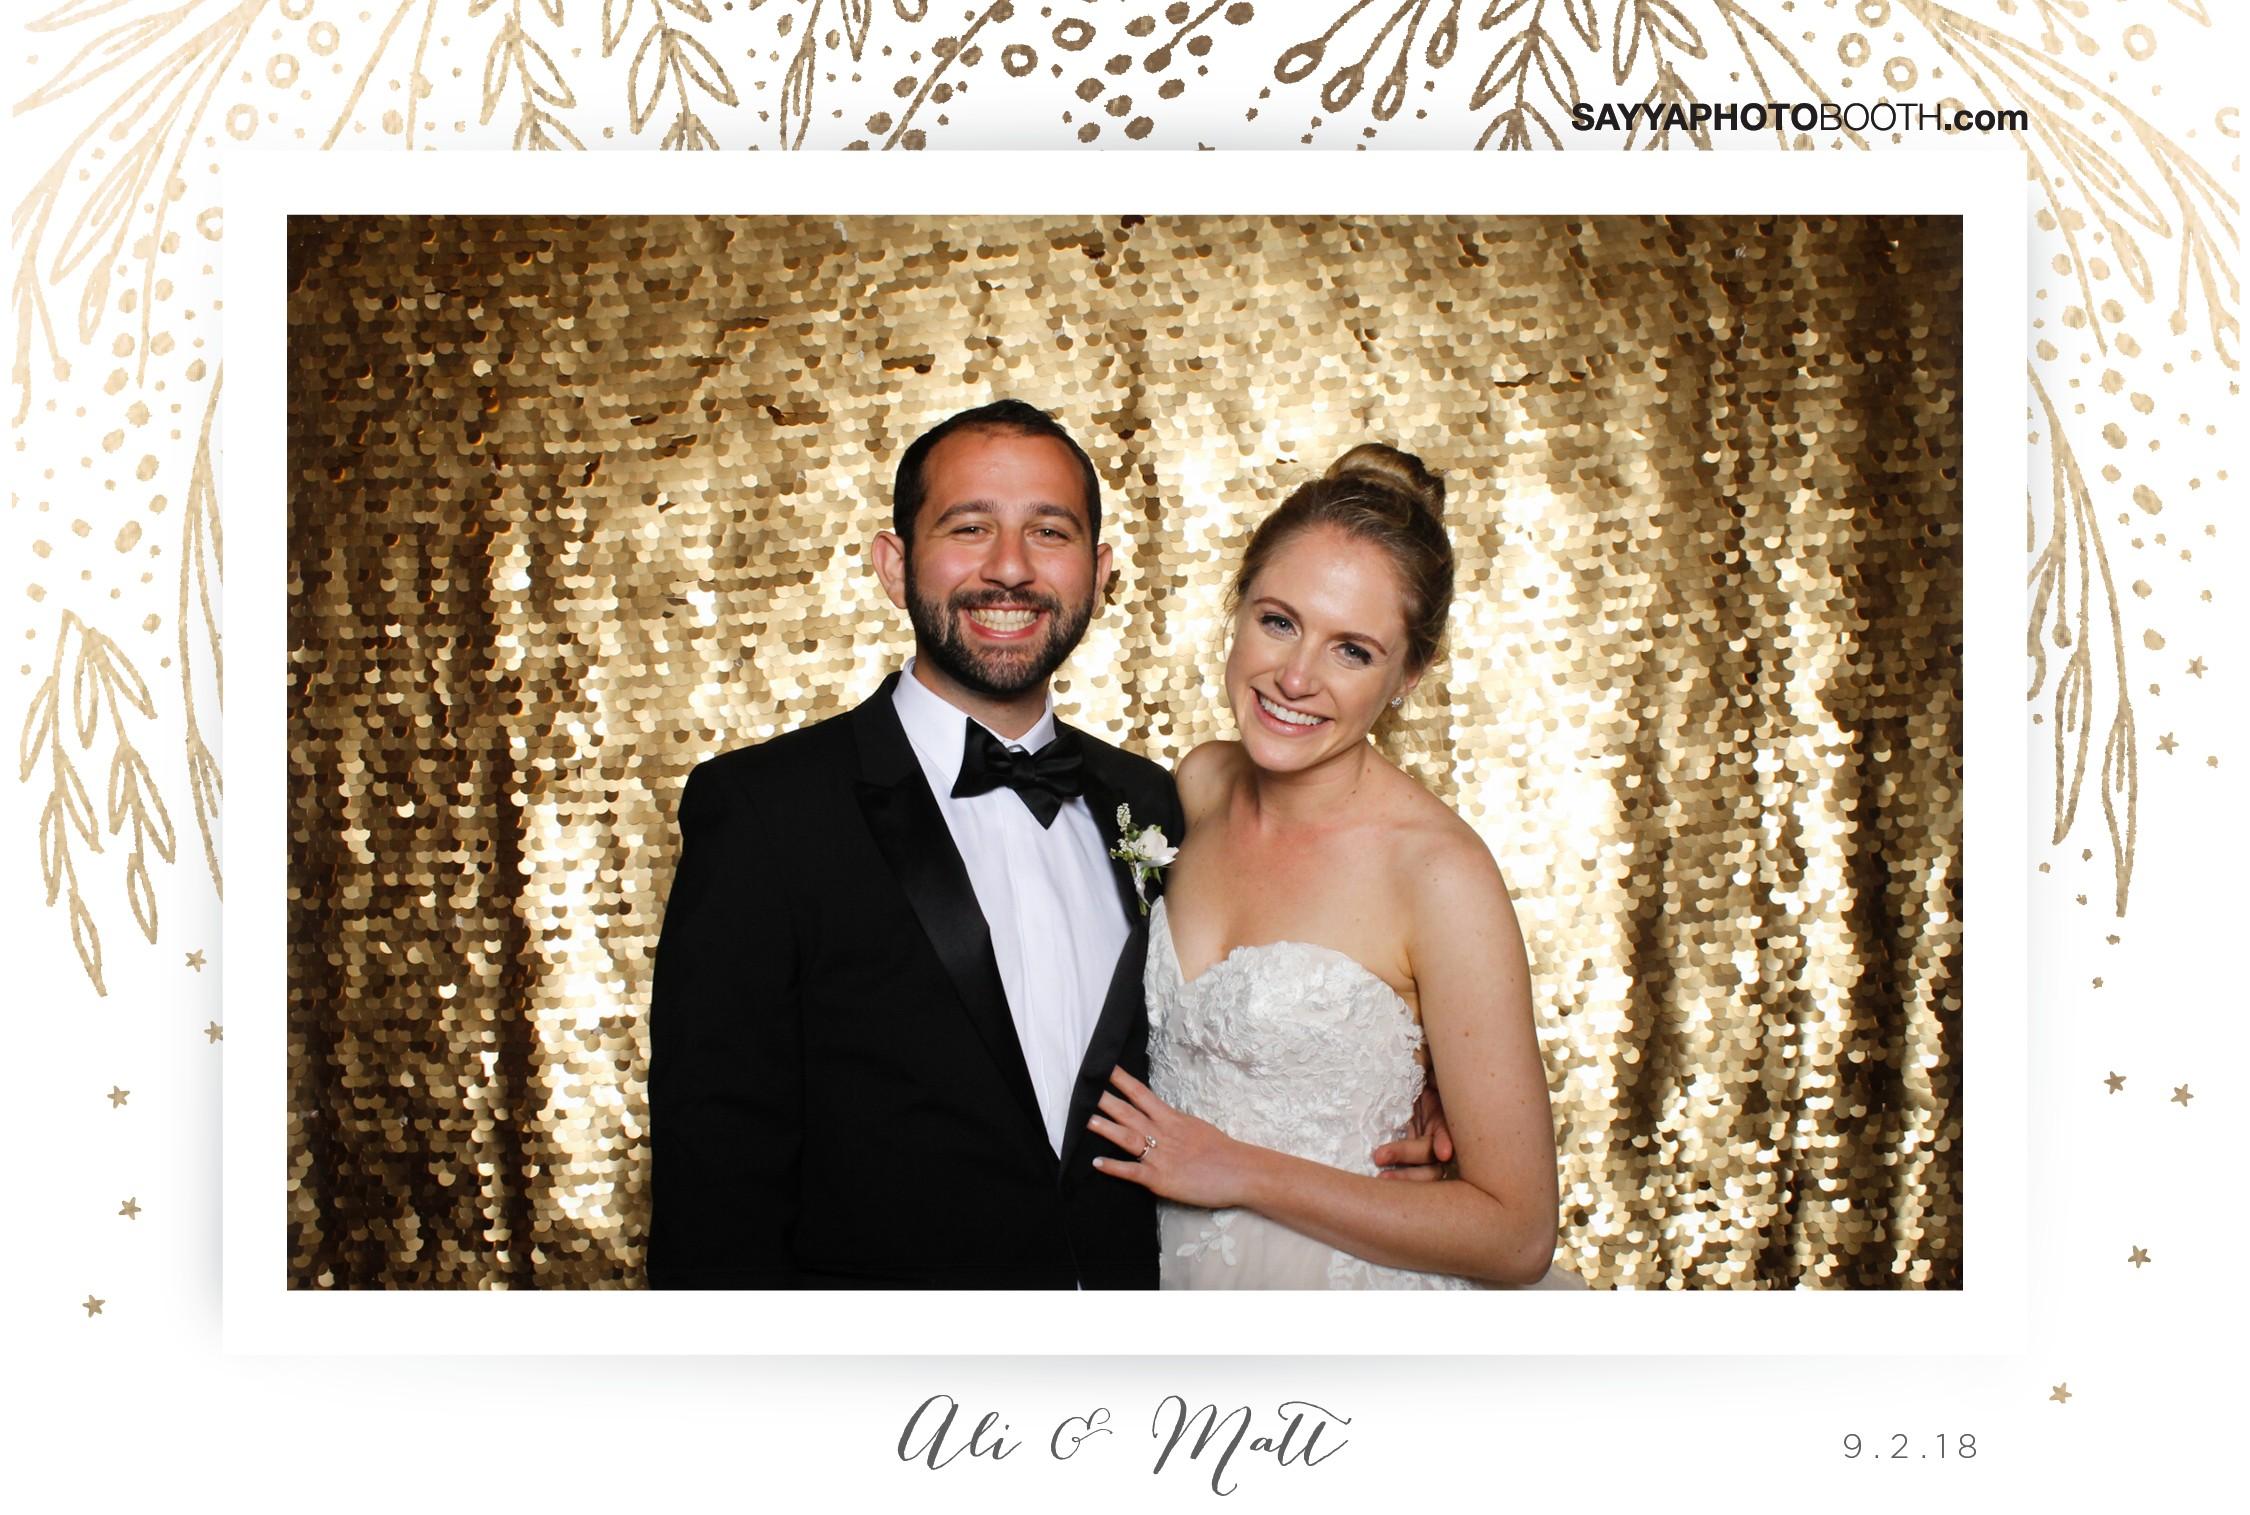 Ali and Matt's Wedding